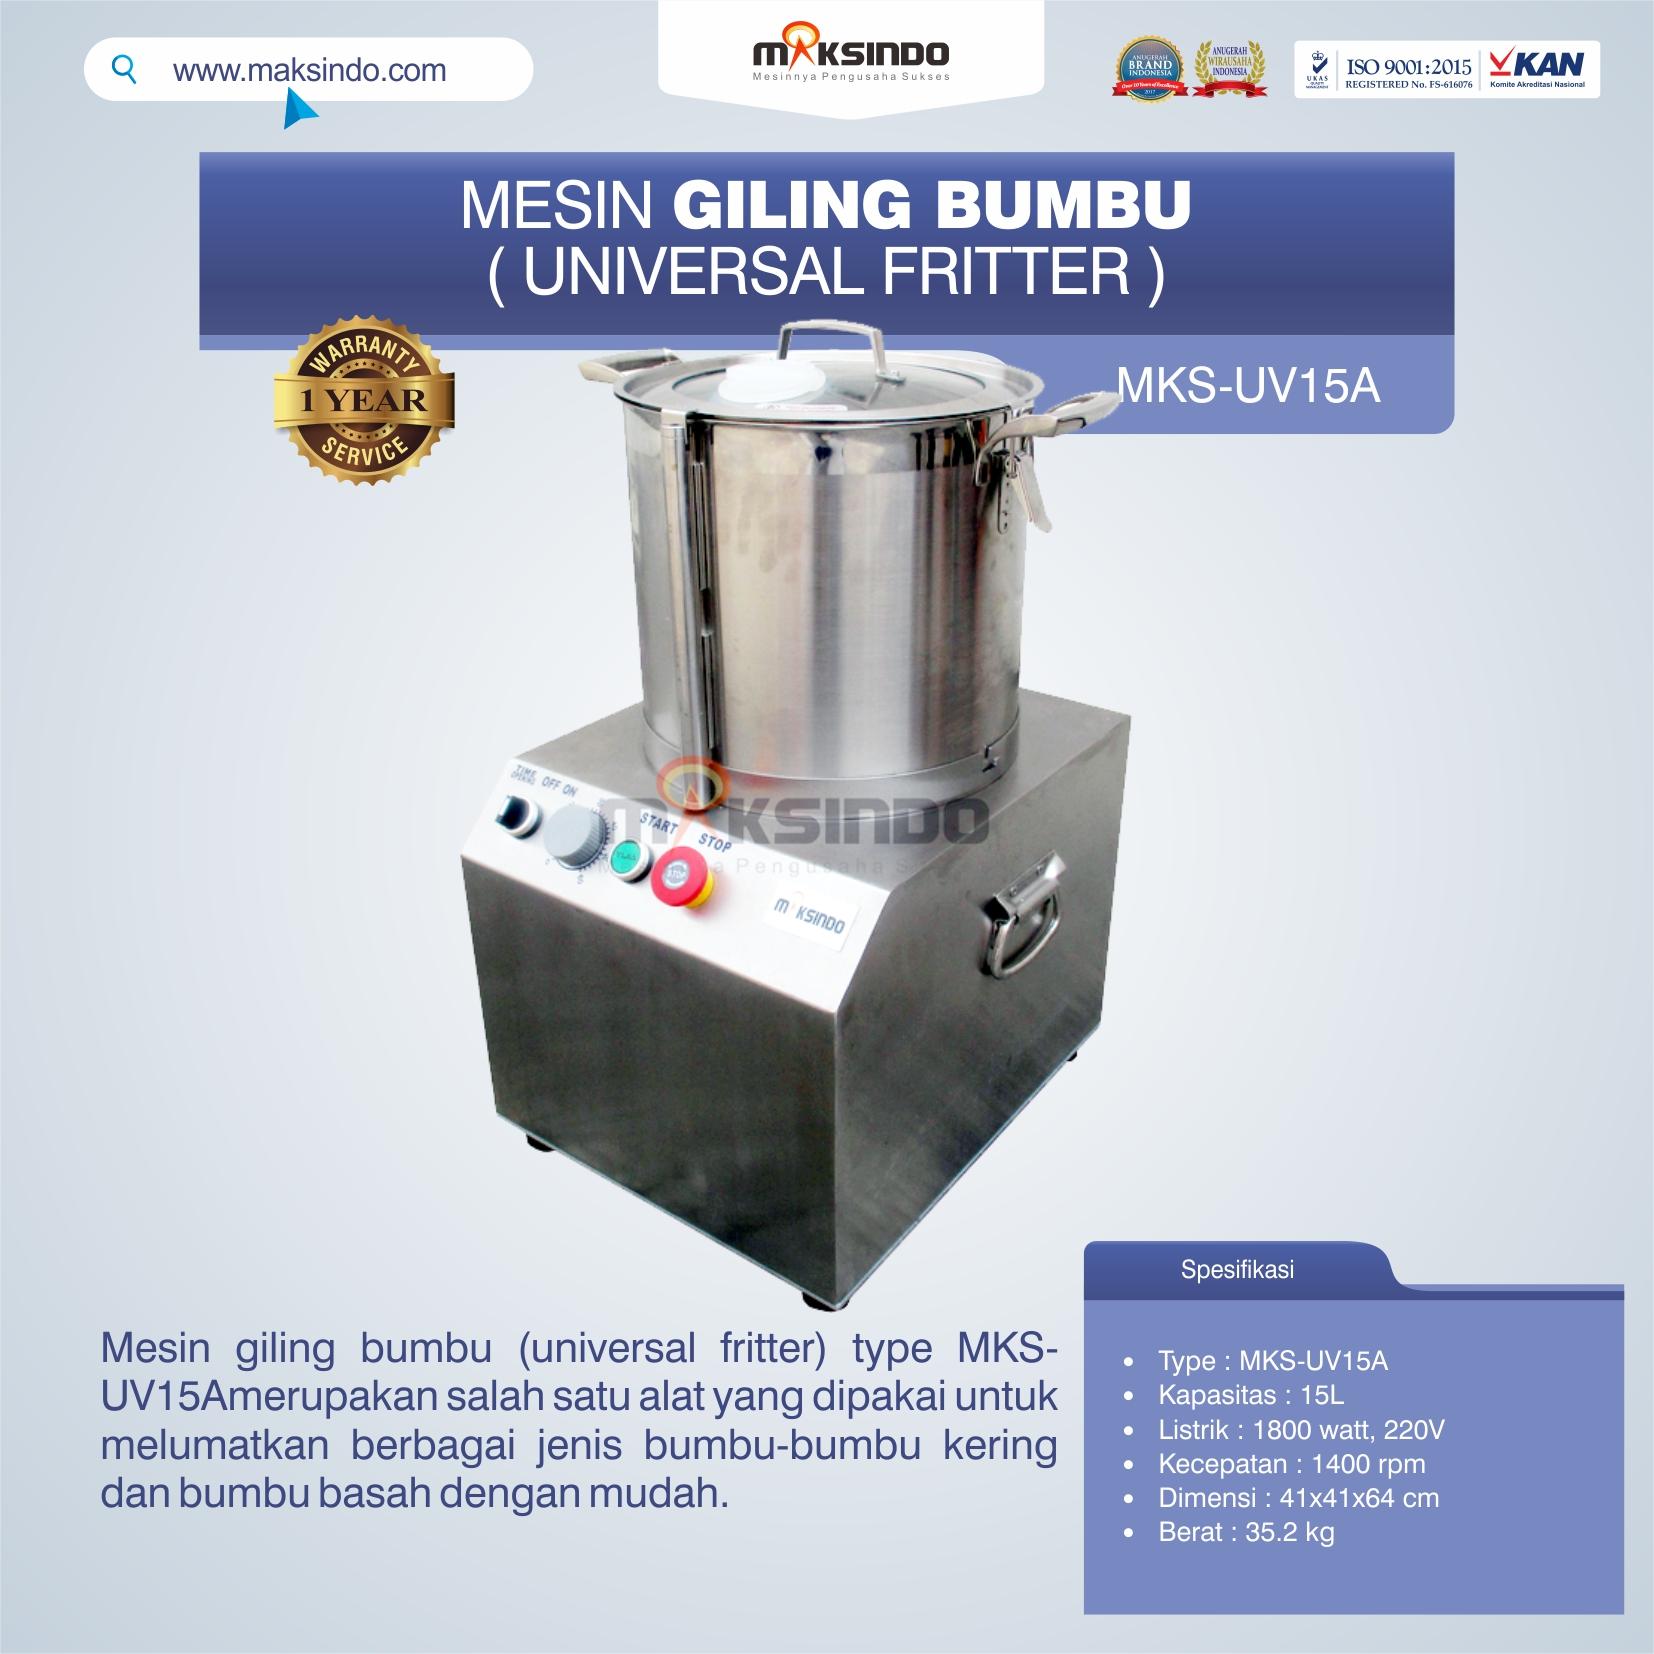 Jual Mesin Giling Bumbu (Universal Fritter) MKS-UV15A di Tangerang